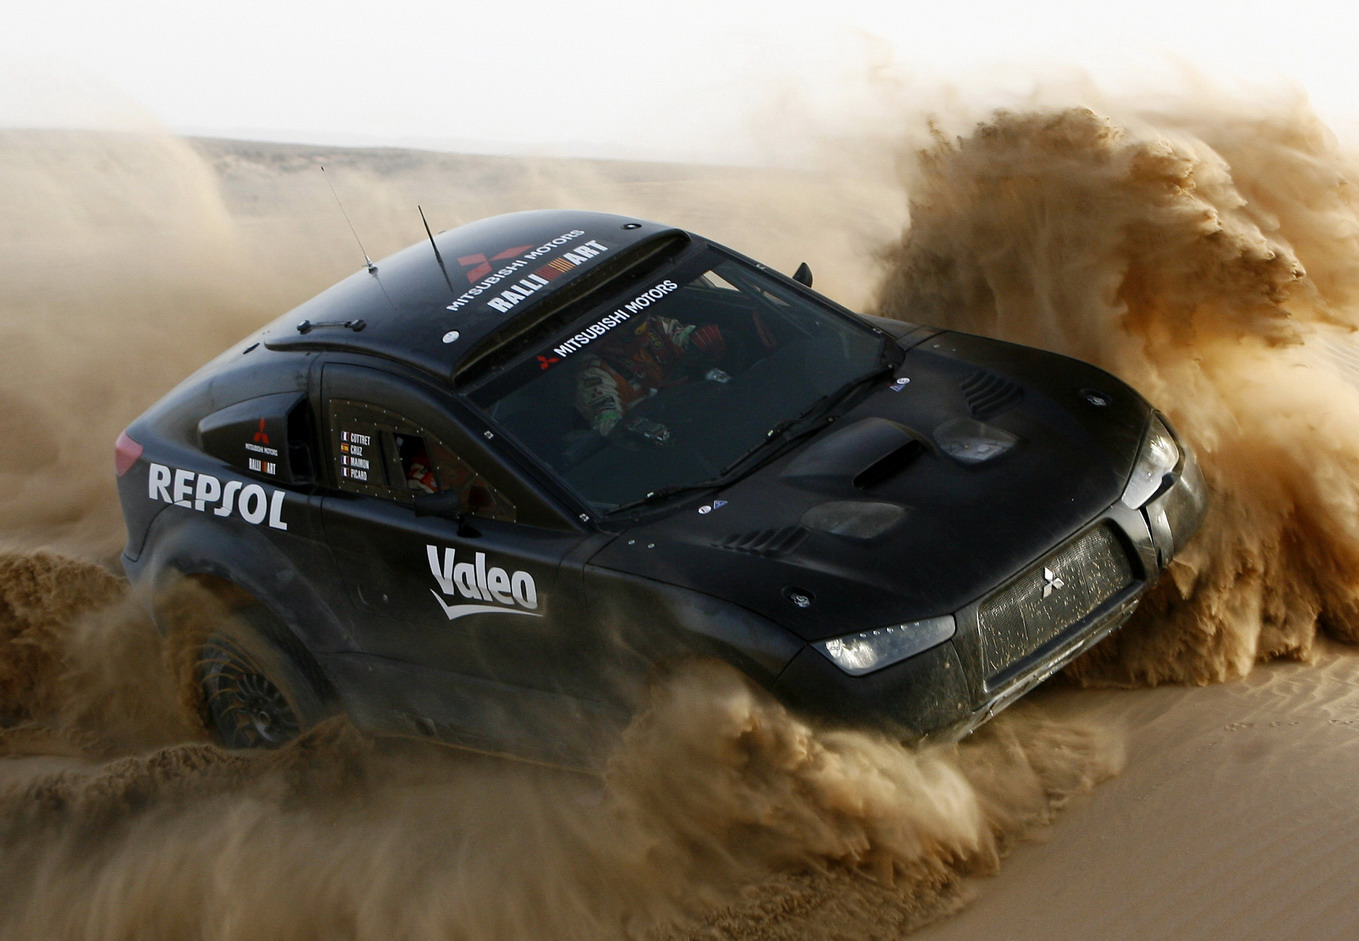 Dakar, car rally, black MITSUBISHI, скачать фото, Дакар, авто